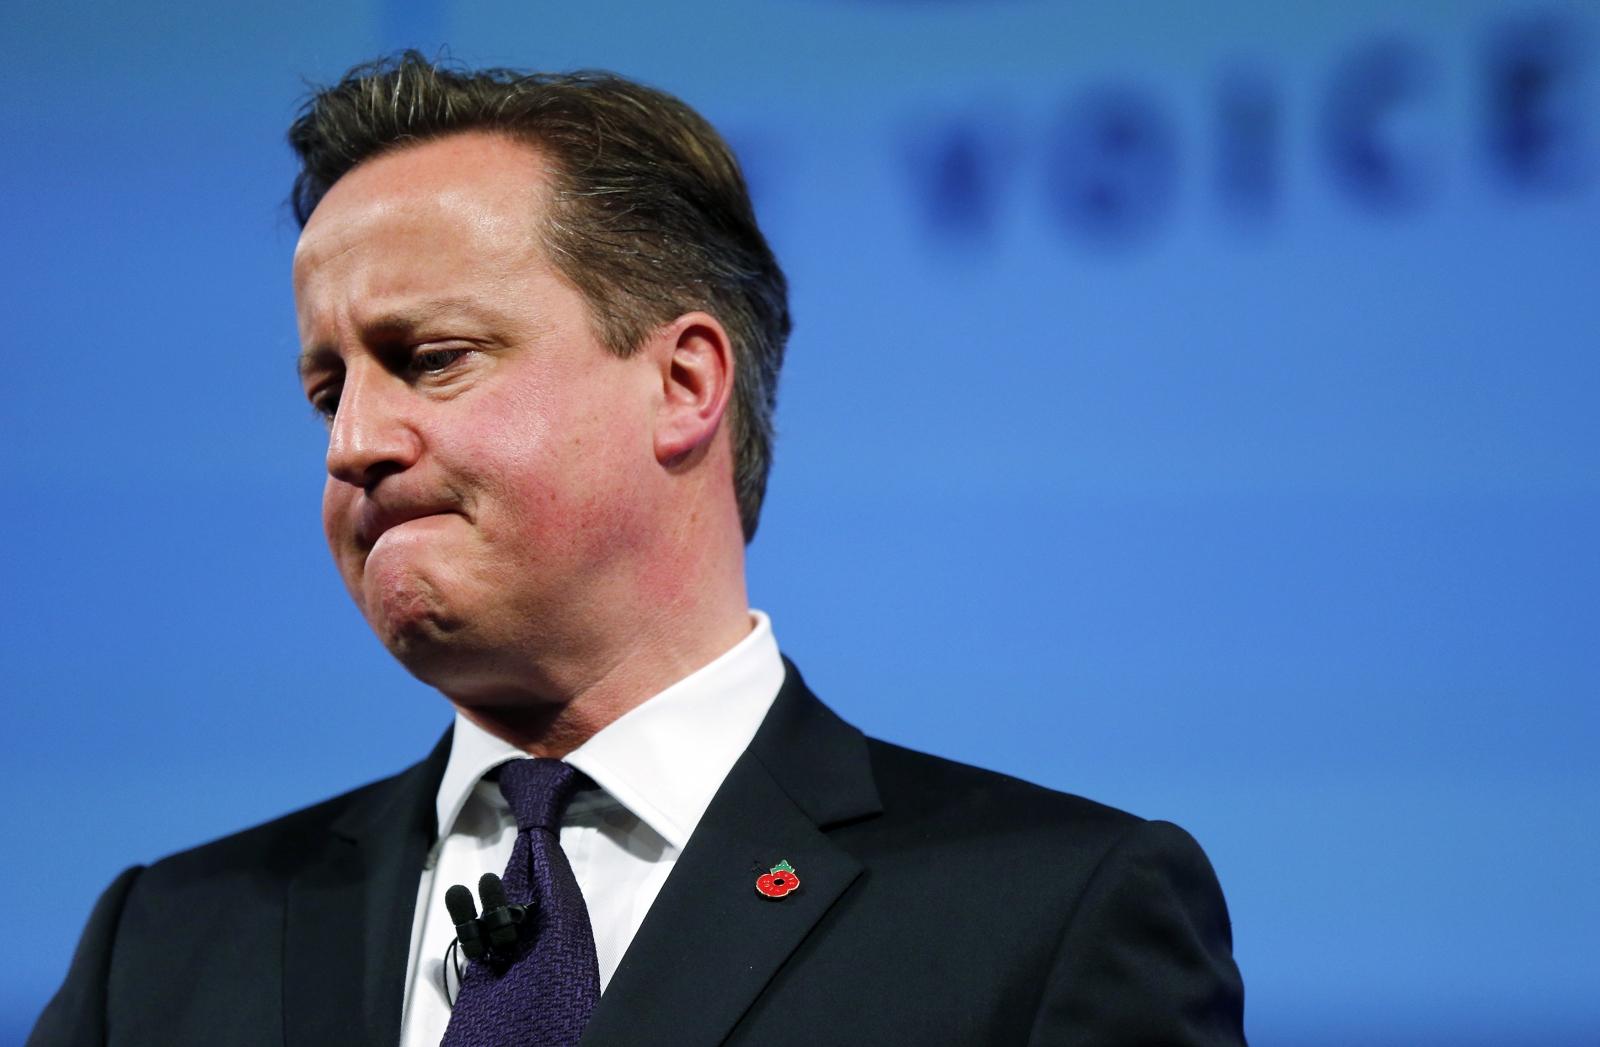 David Cameron on global economy